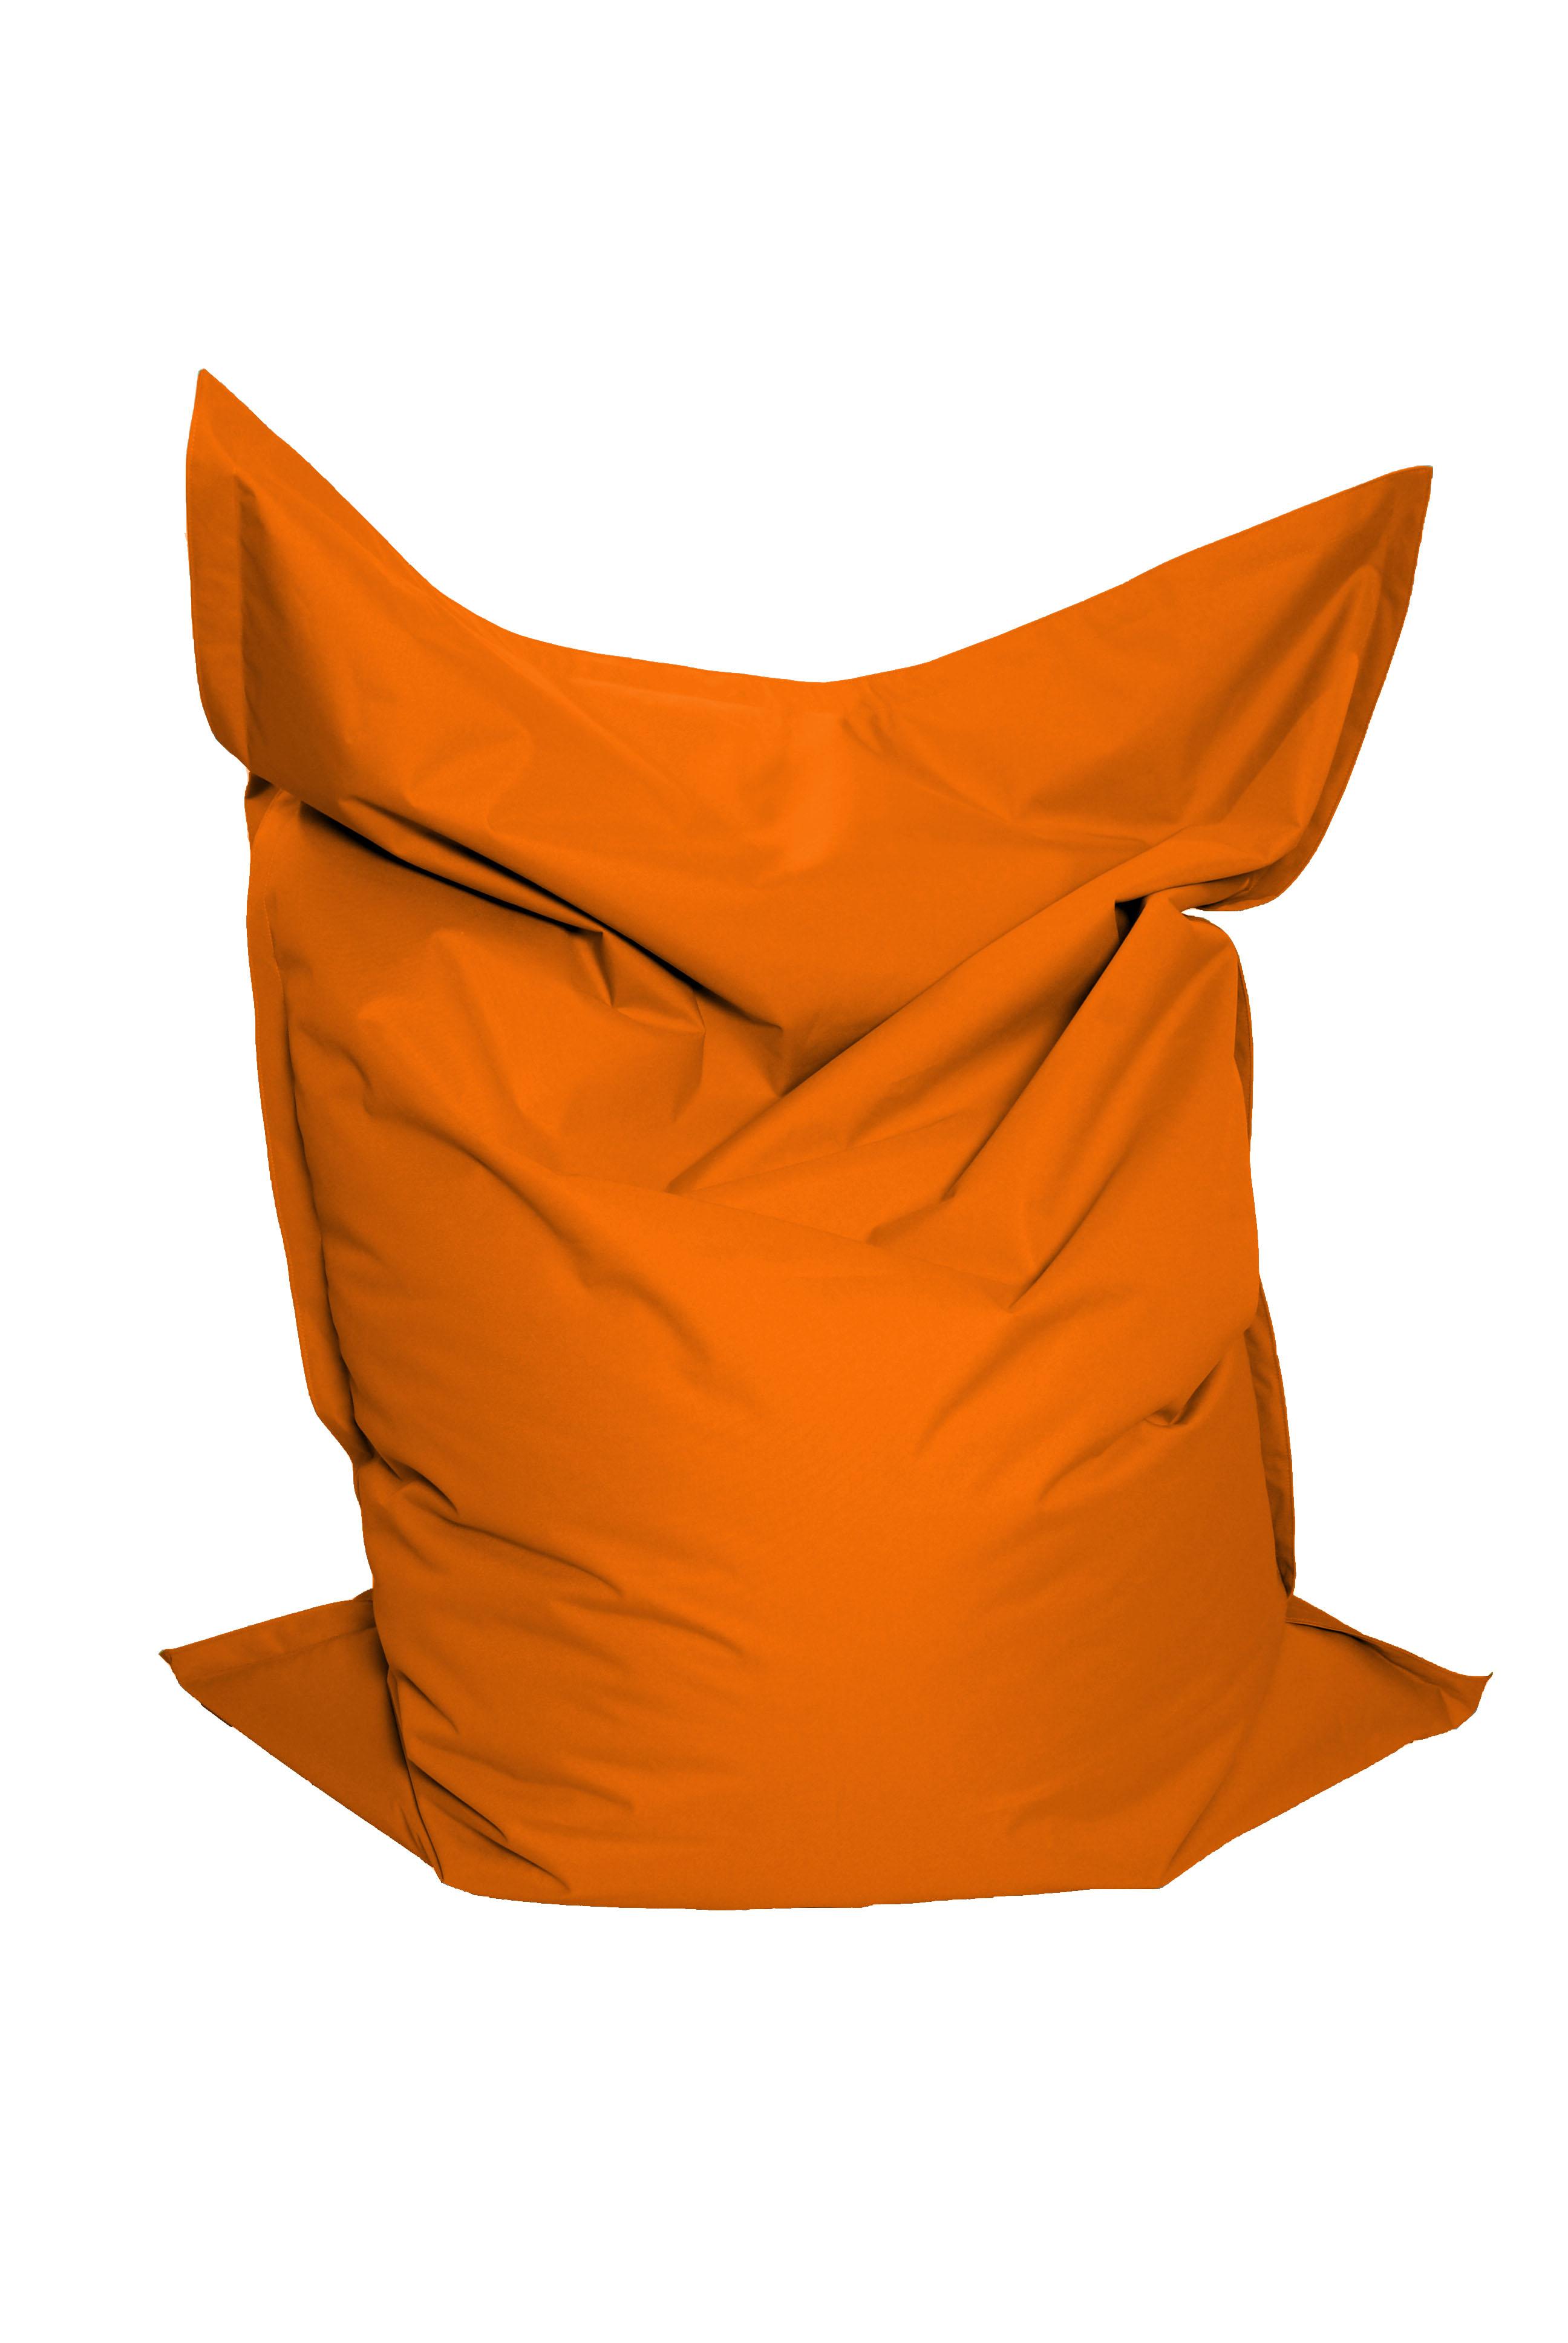 M&M sedací vak Standard 141X180cm oranžová (oranžová 60012)